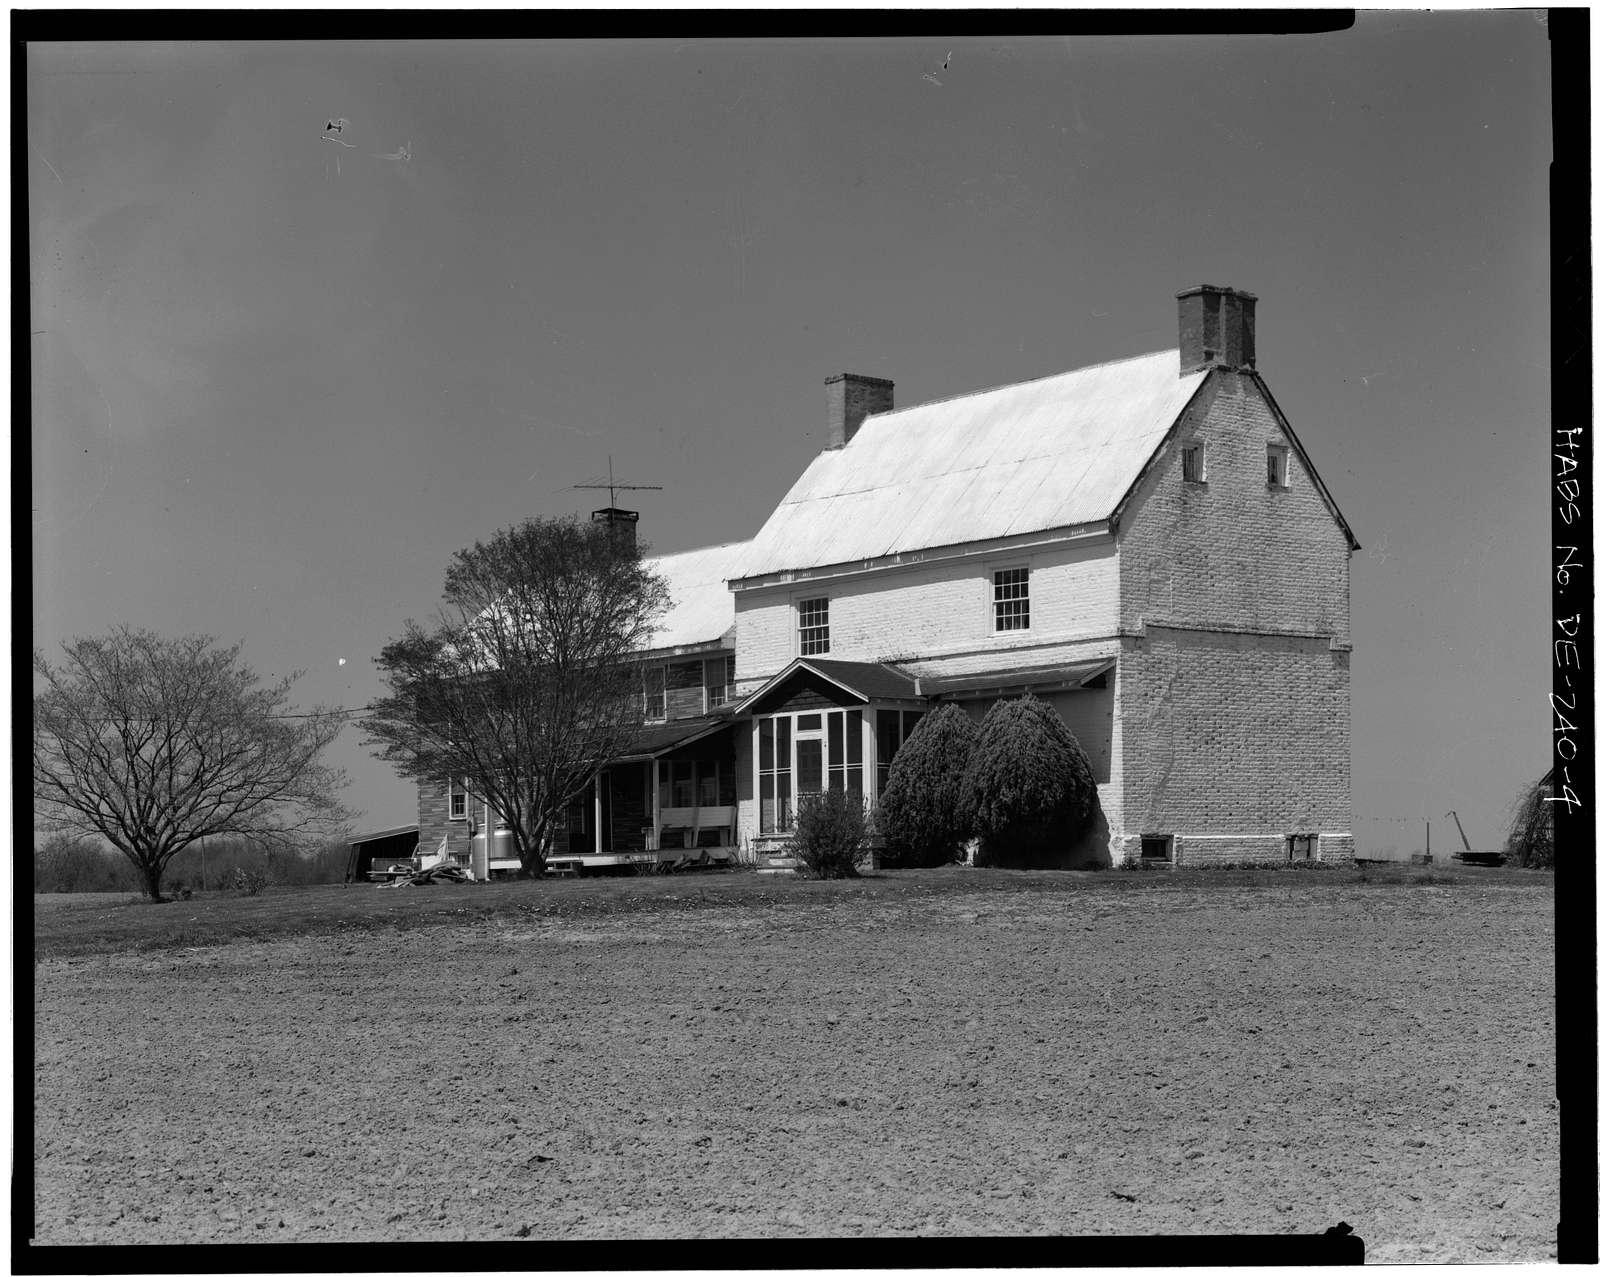 Robert Ashton House, Road 418, West of Route 2, Port Penn, New Castle County, DE